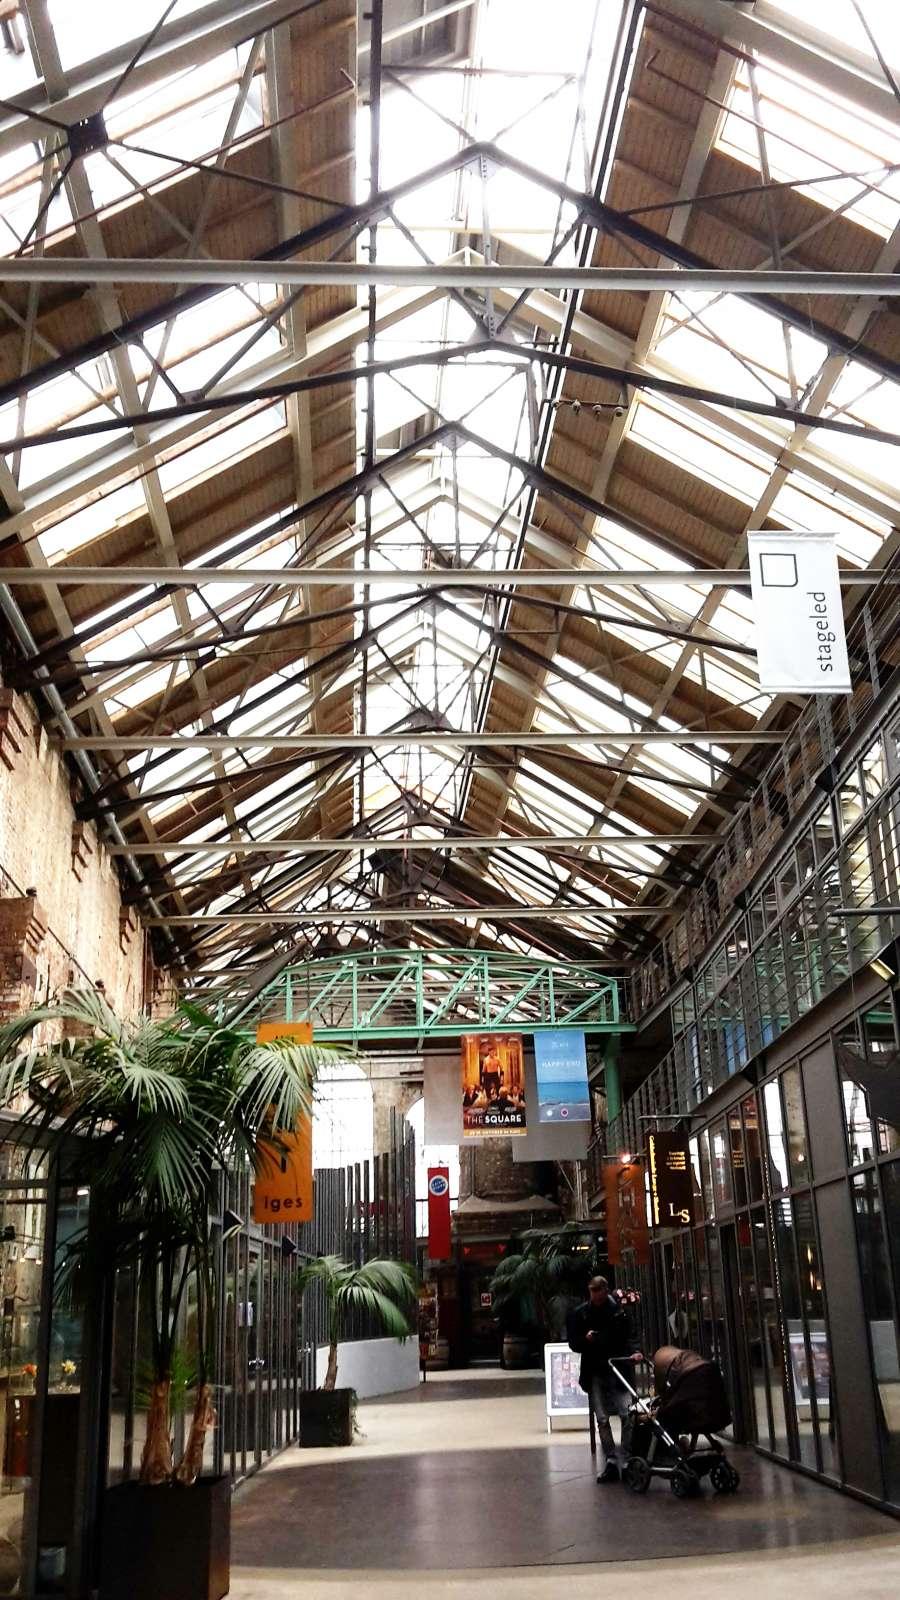 Zeise-Hallen